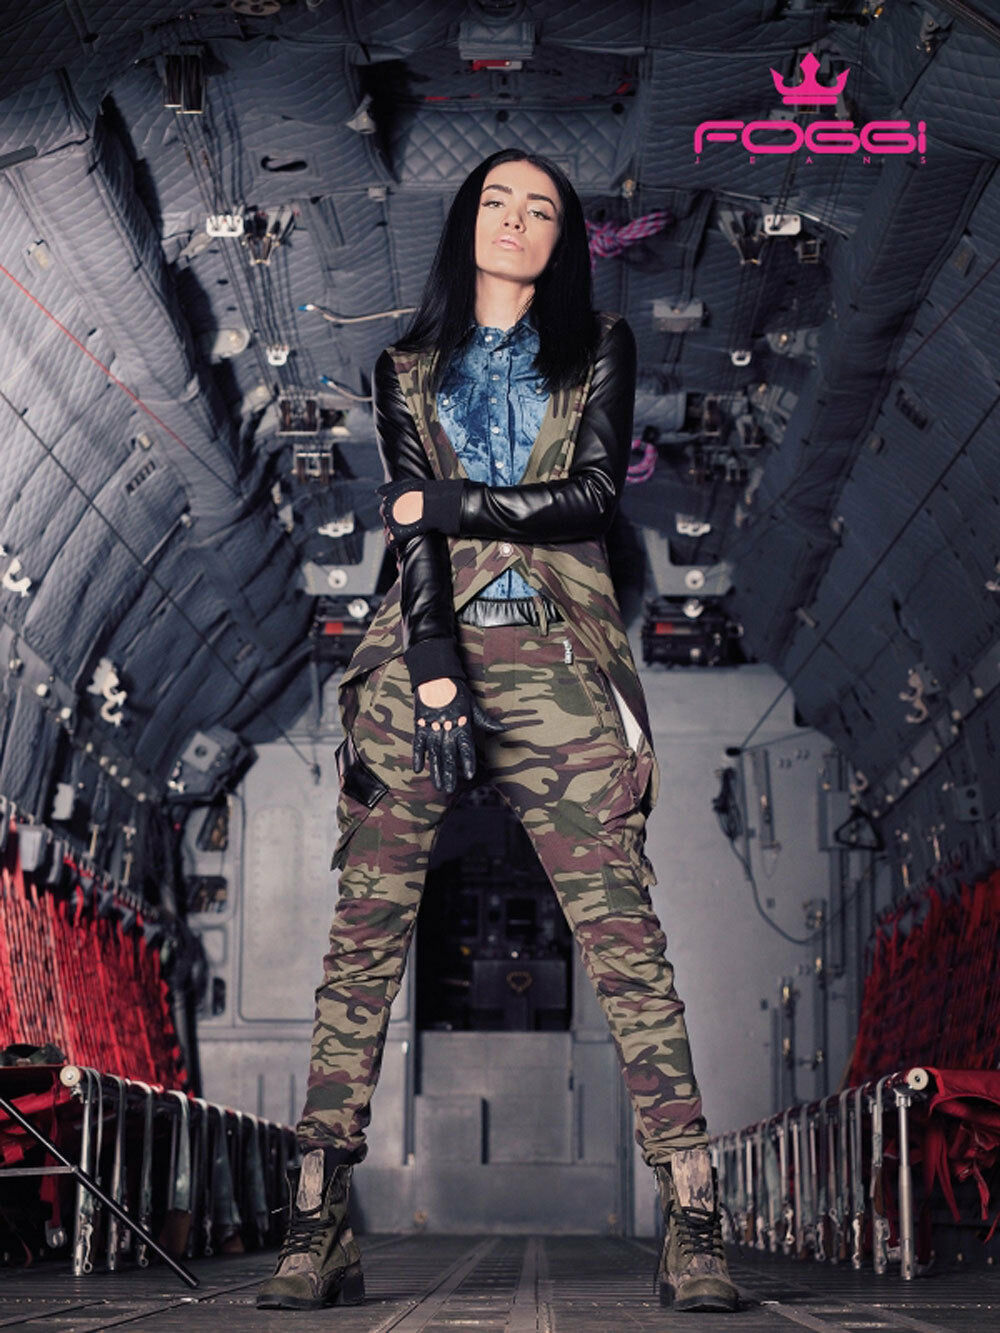 Foggi 2-Teiler Set Camouflage Jacke Bolero Boyfriendhose Lederlook Tarn Hose S-L